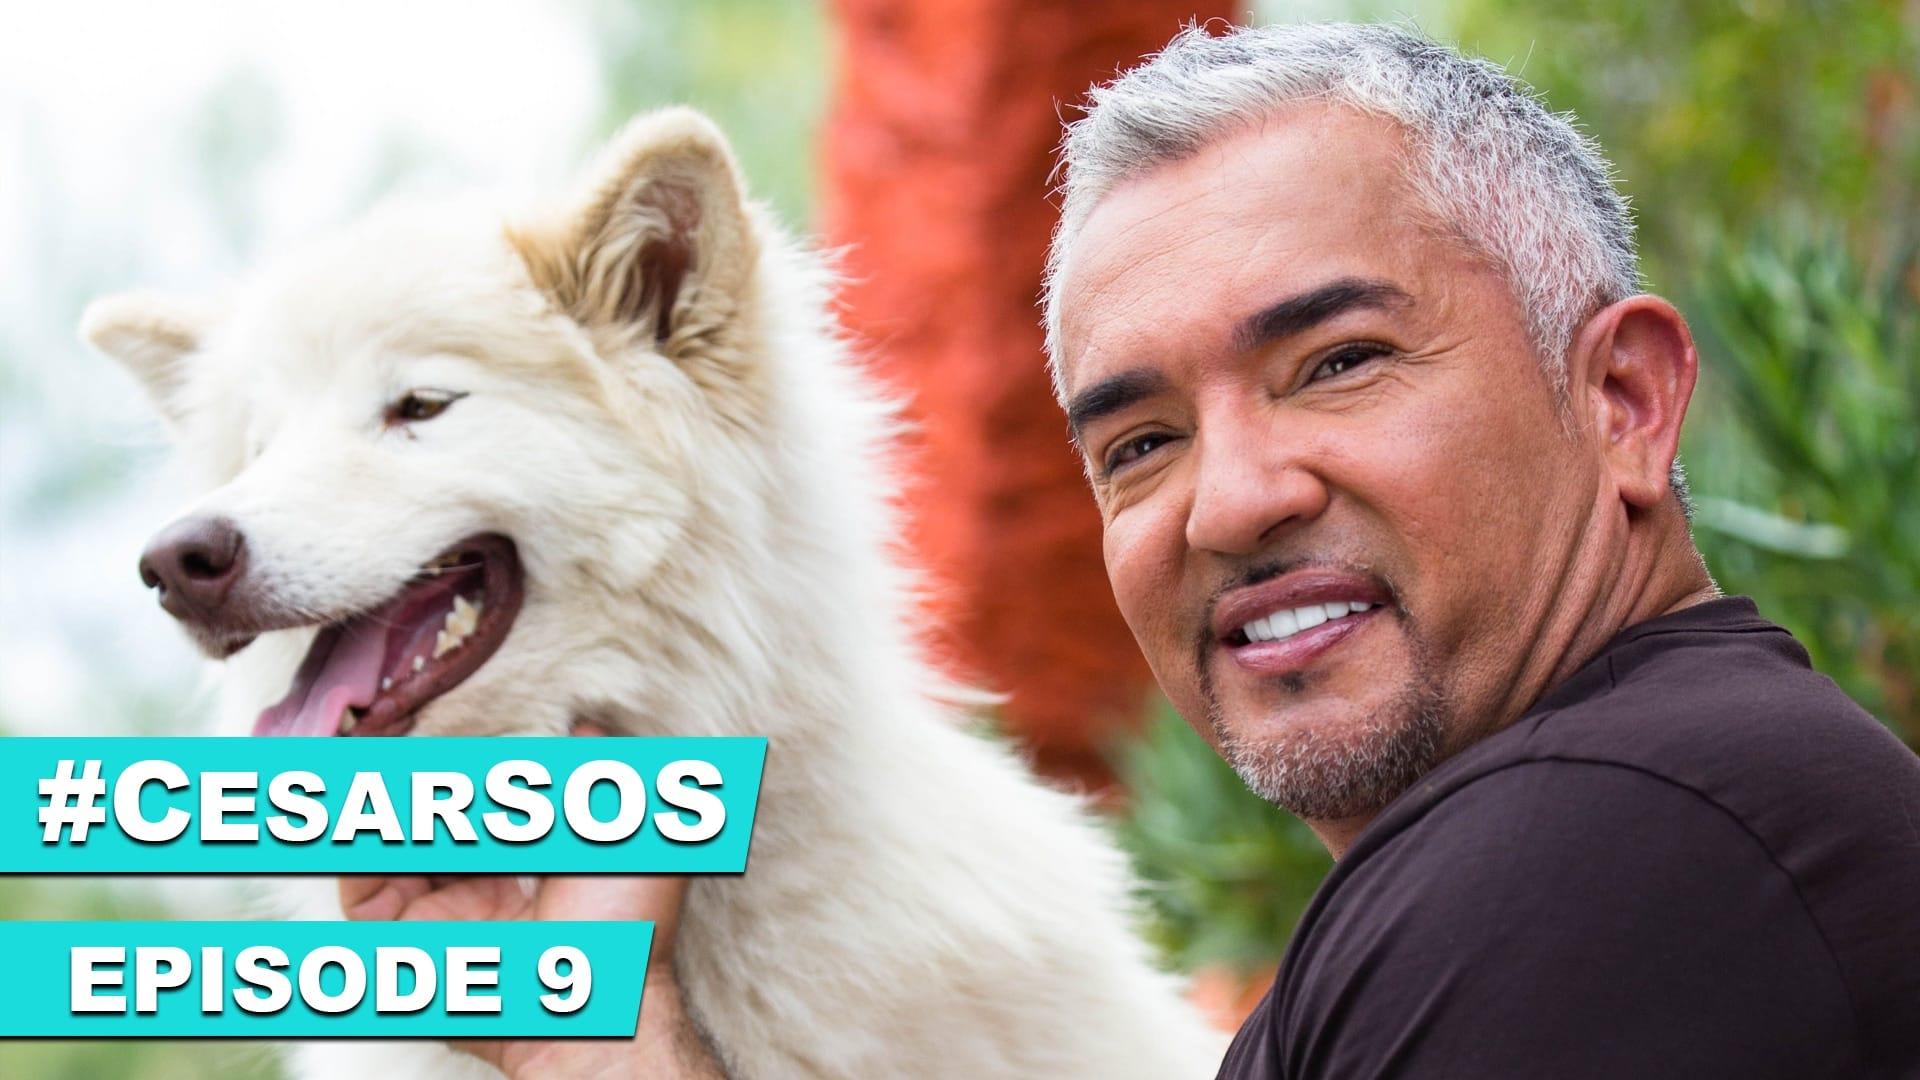 #CesarSOS Episode 9